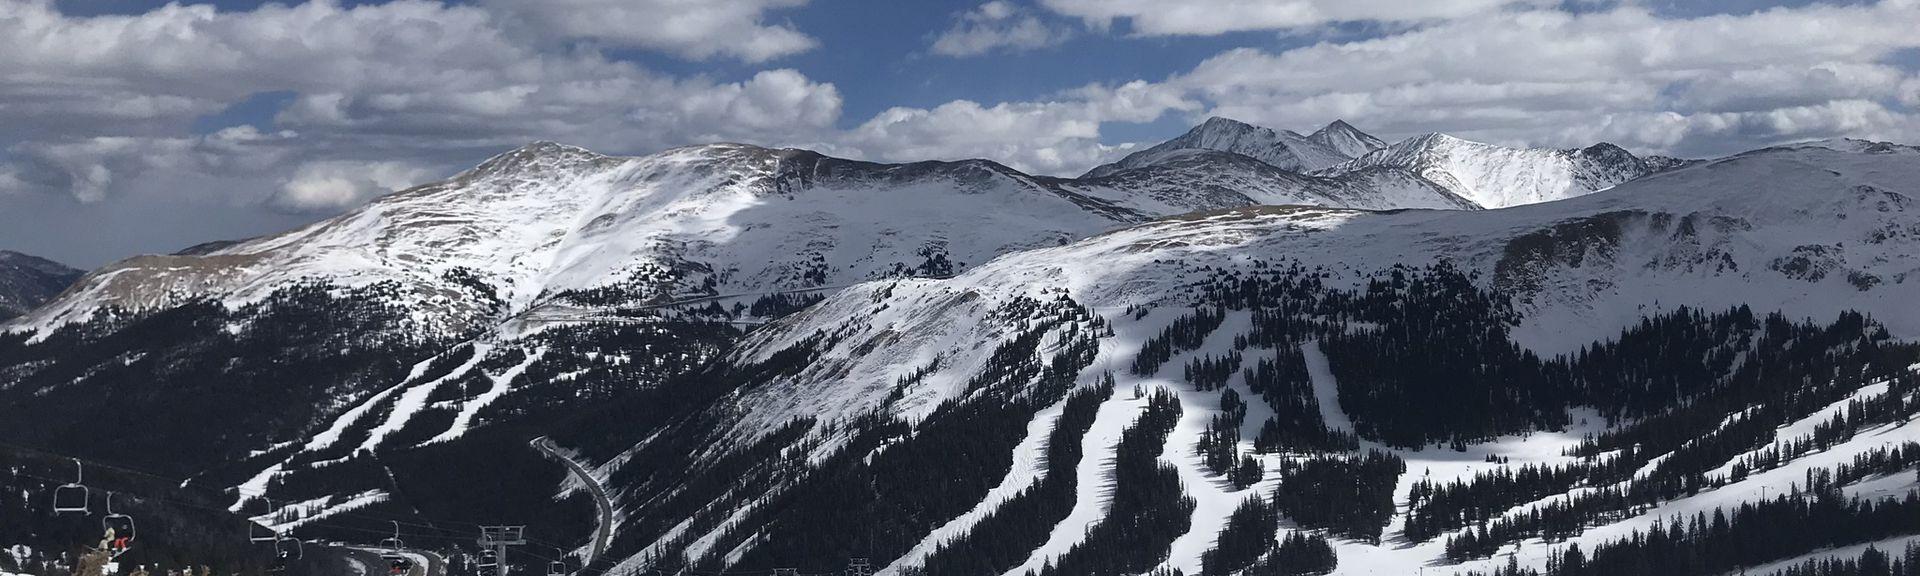 Front Range, Arapaho National Forest, Colorado, USA